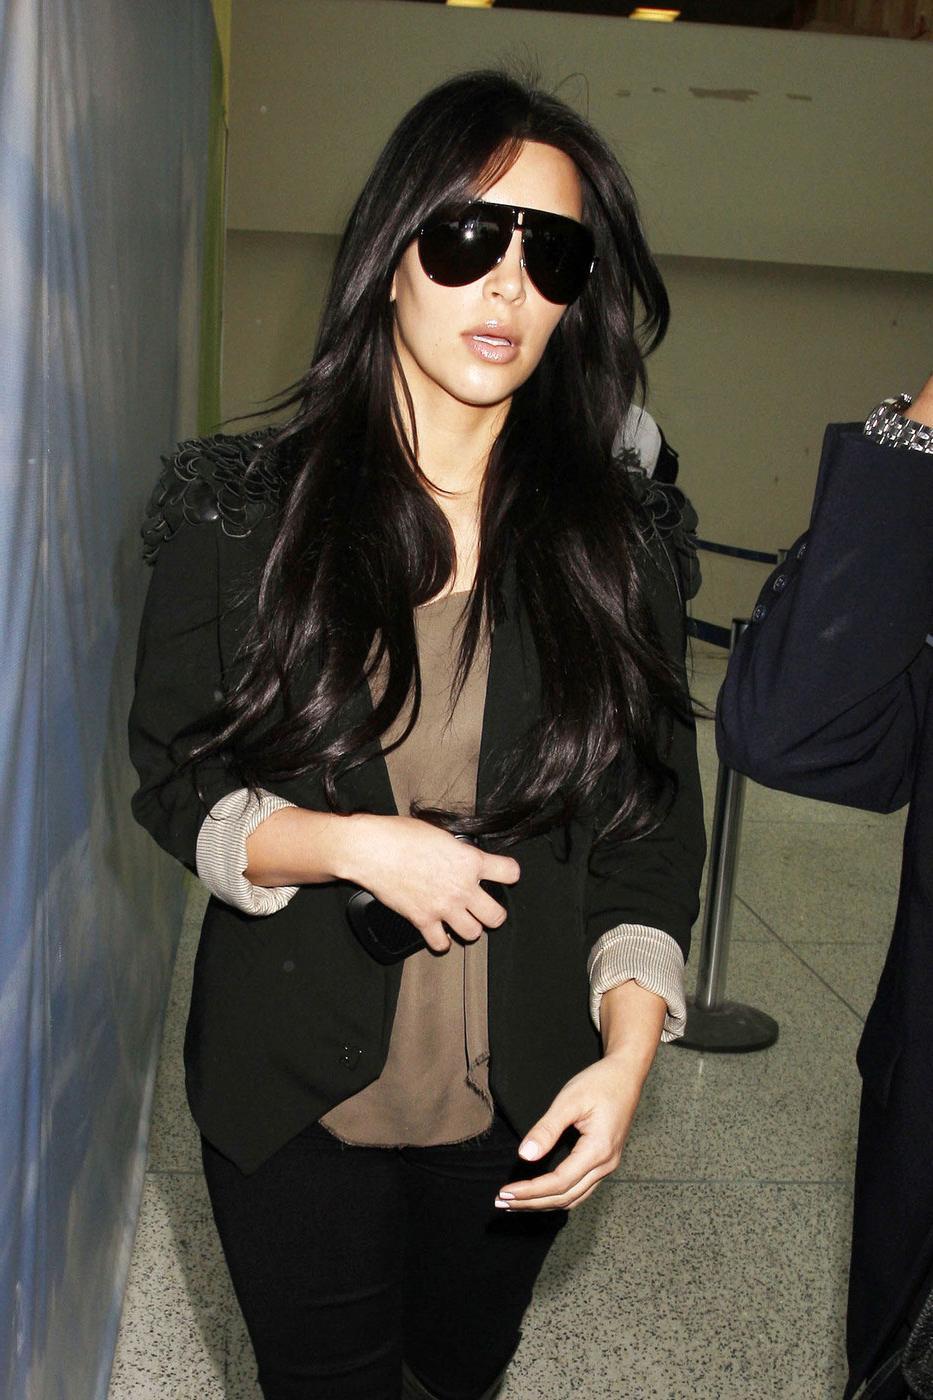 worked for Kim Kardashian